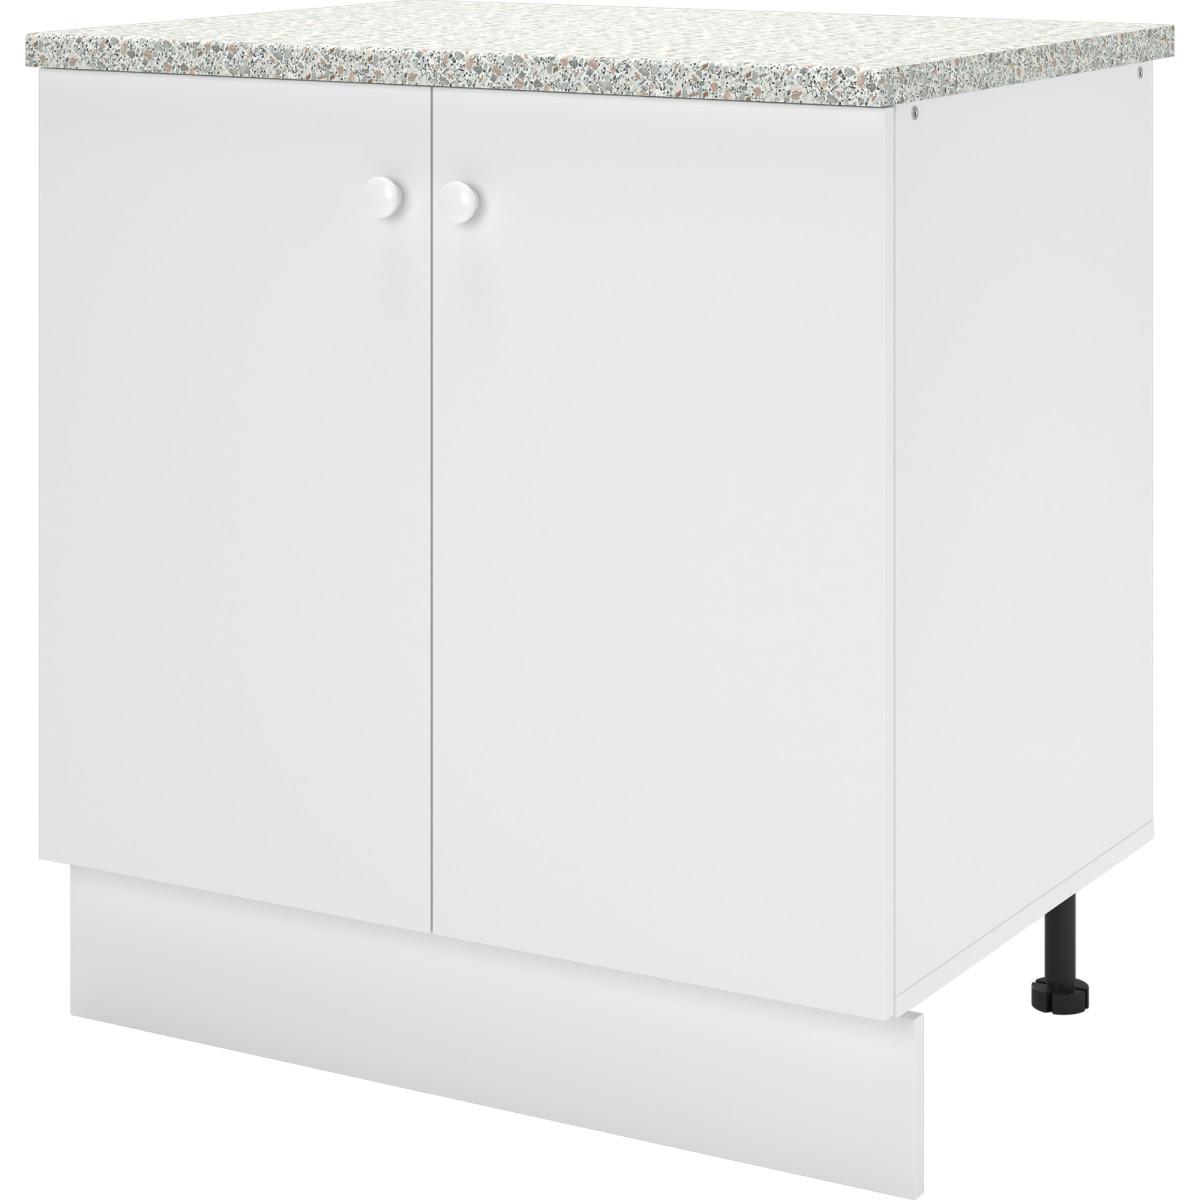 Шкаф напольный Бэлла 80x84x60 см ЛДСП цвет белый